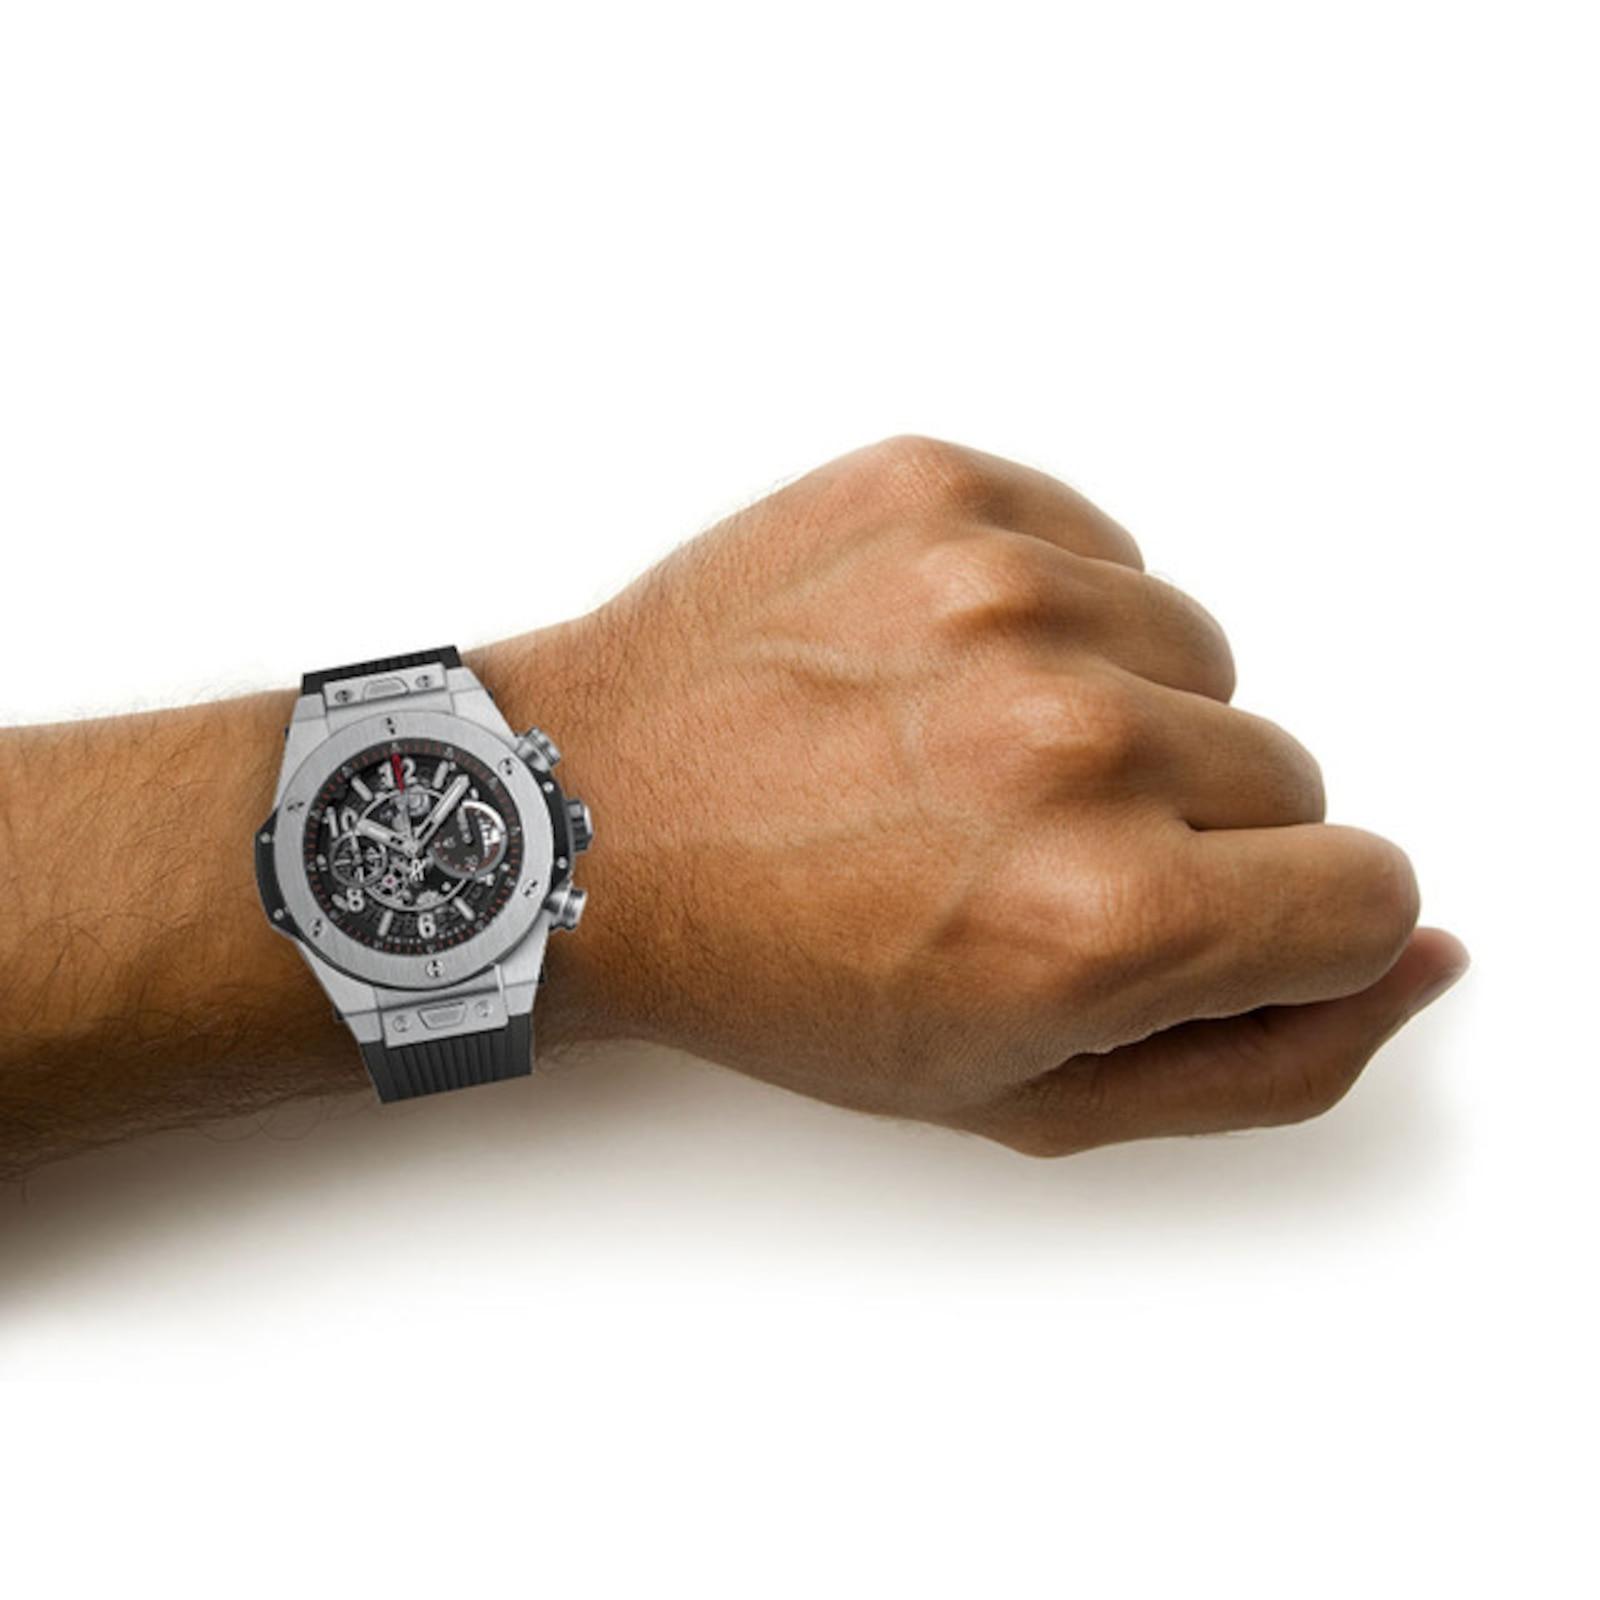 Hublot Hublot Big Bang UNICO Titanium 45mm Mens Watch